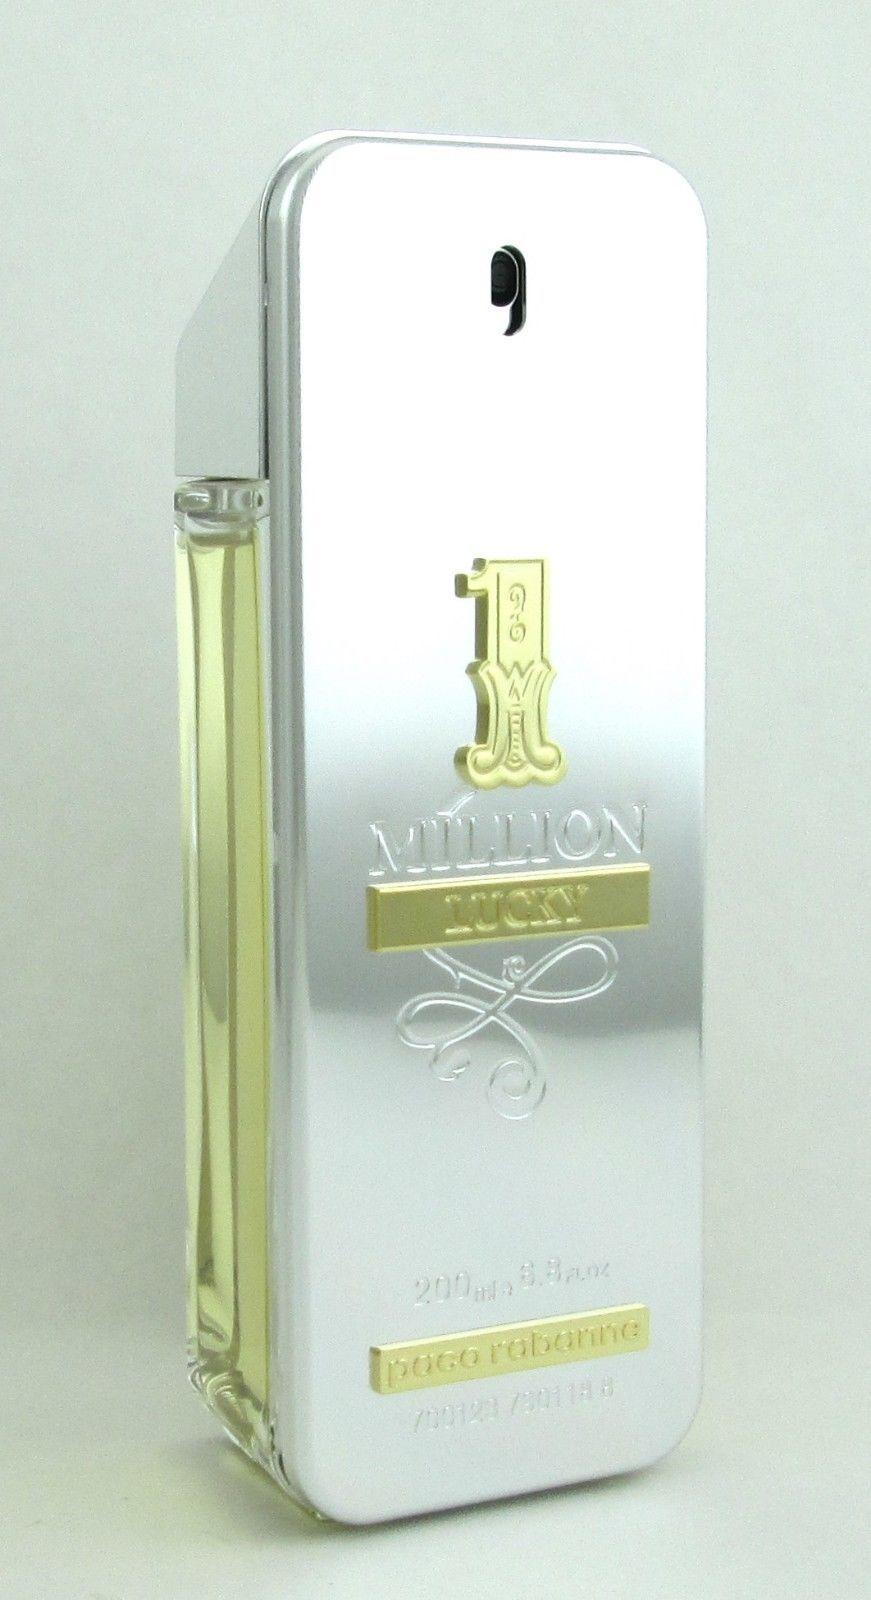 89 99 1 One Million Lucky Cologne Paco Rabanne 6 8 Oz Edt Spray For Men New No Box Million Cologne Rabanne Gif Perfume Mens Cologne Eau De Toilette